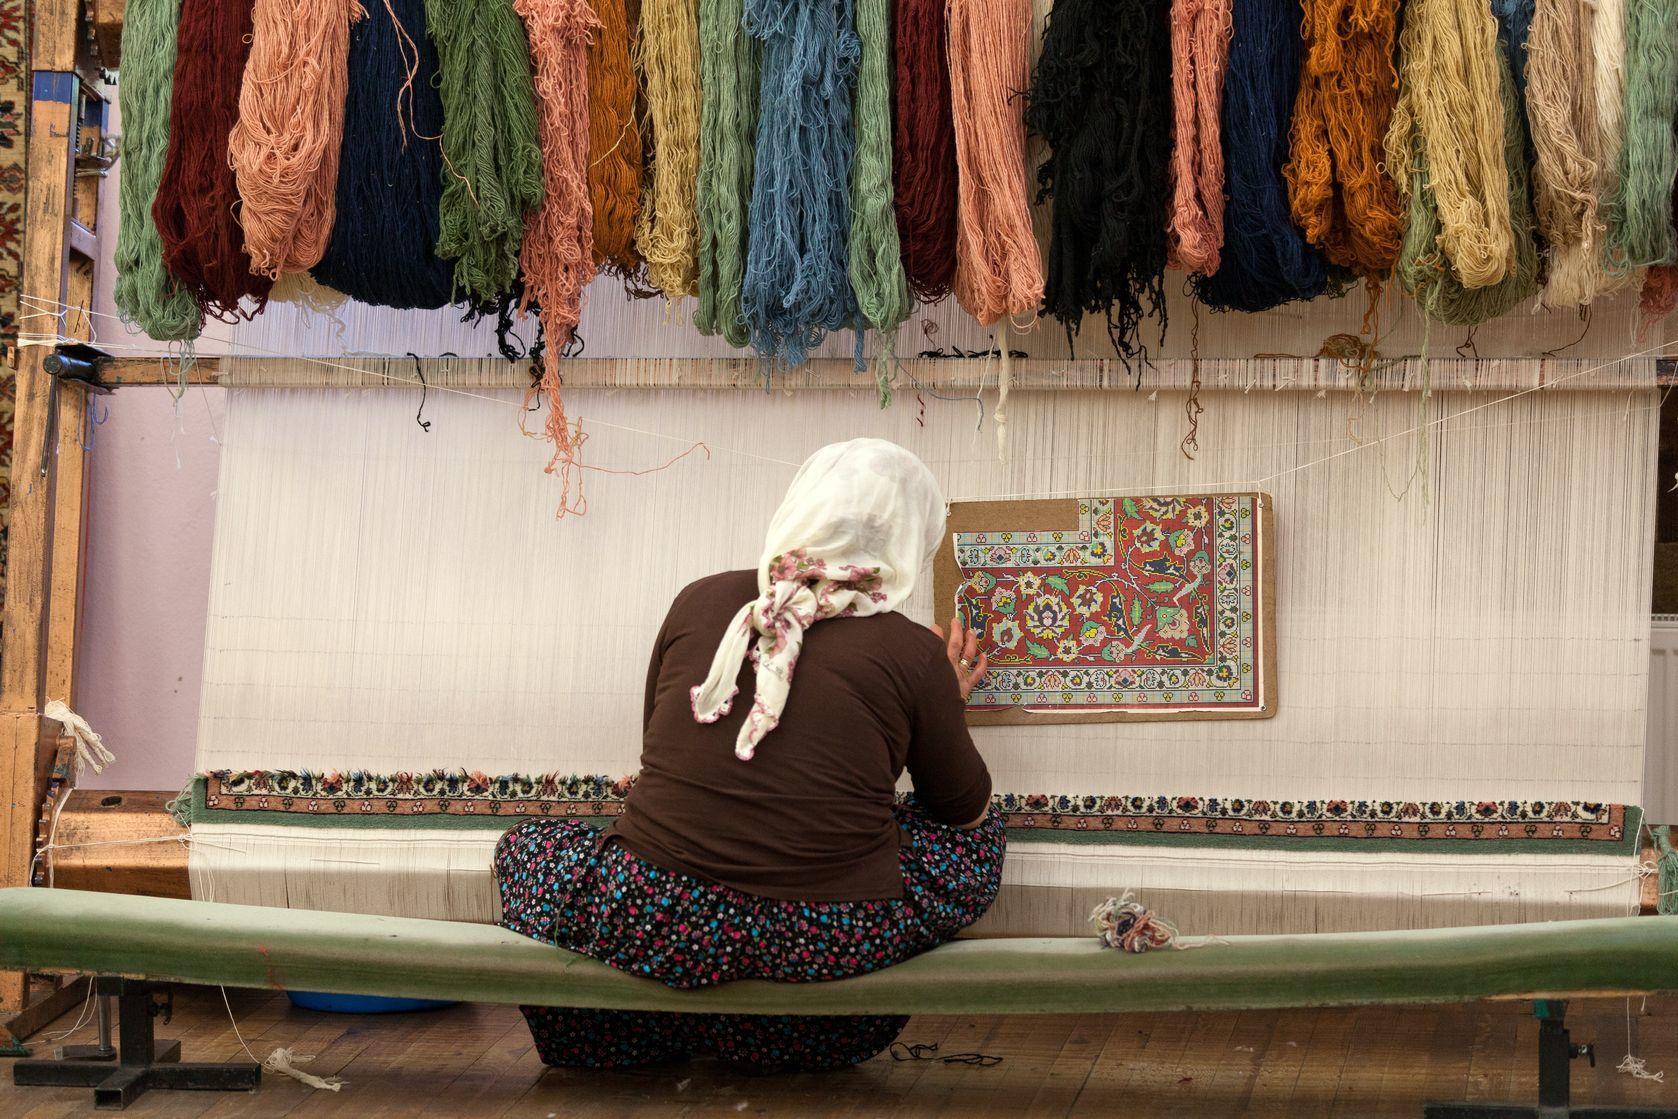 Turecká žena plete hedvábný koberec | wjarek/123RF.com